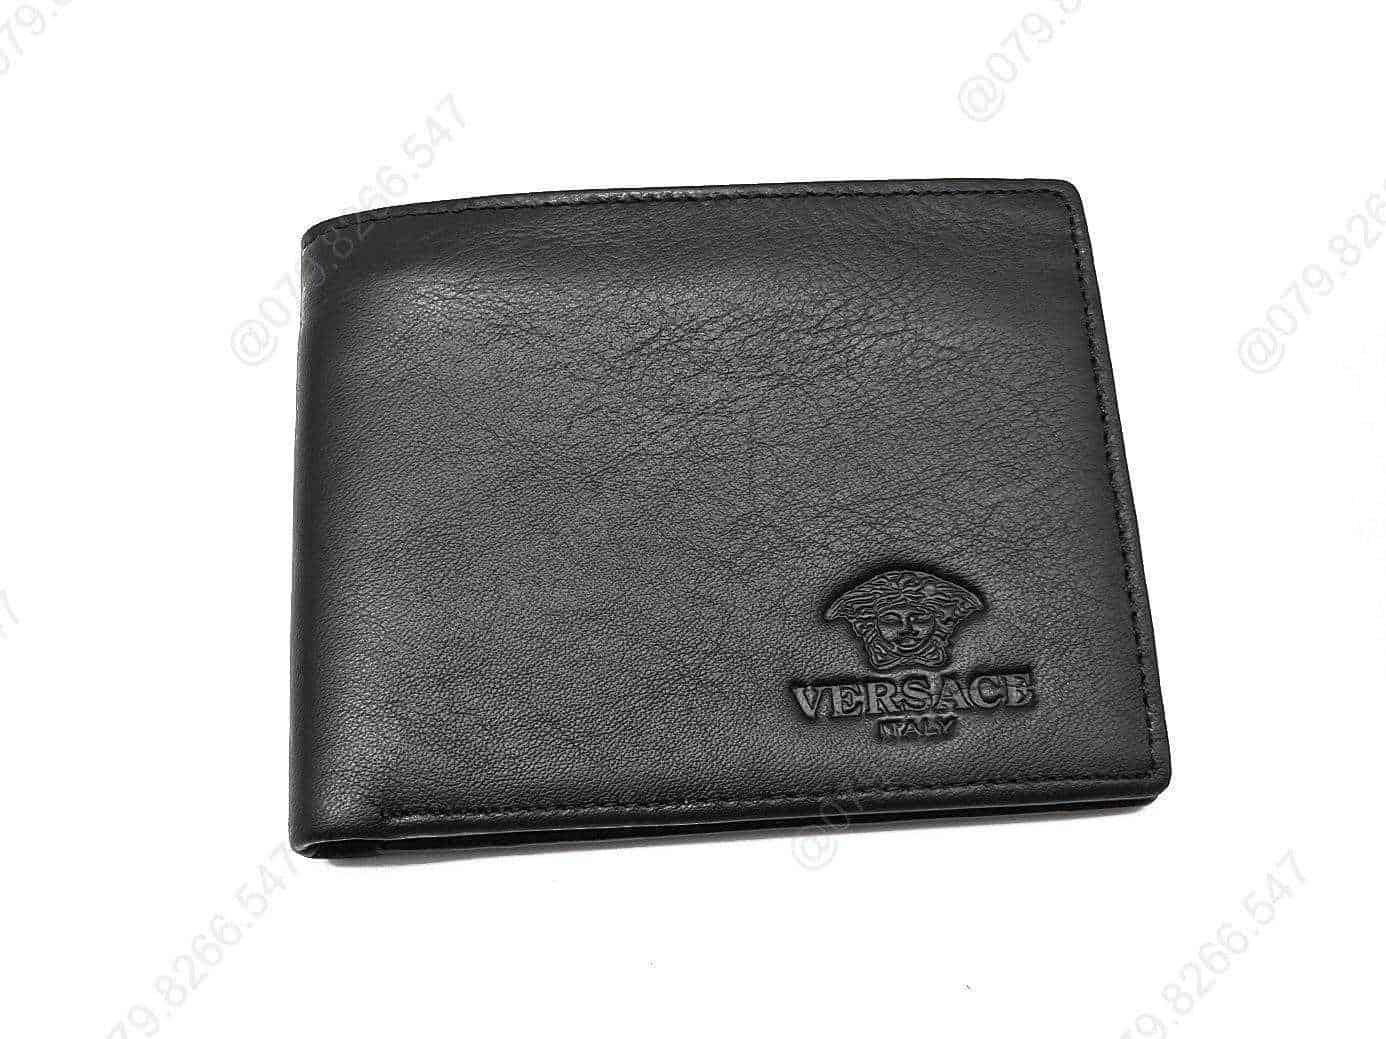 Bóp da nam BNGR-P622